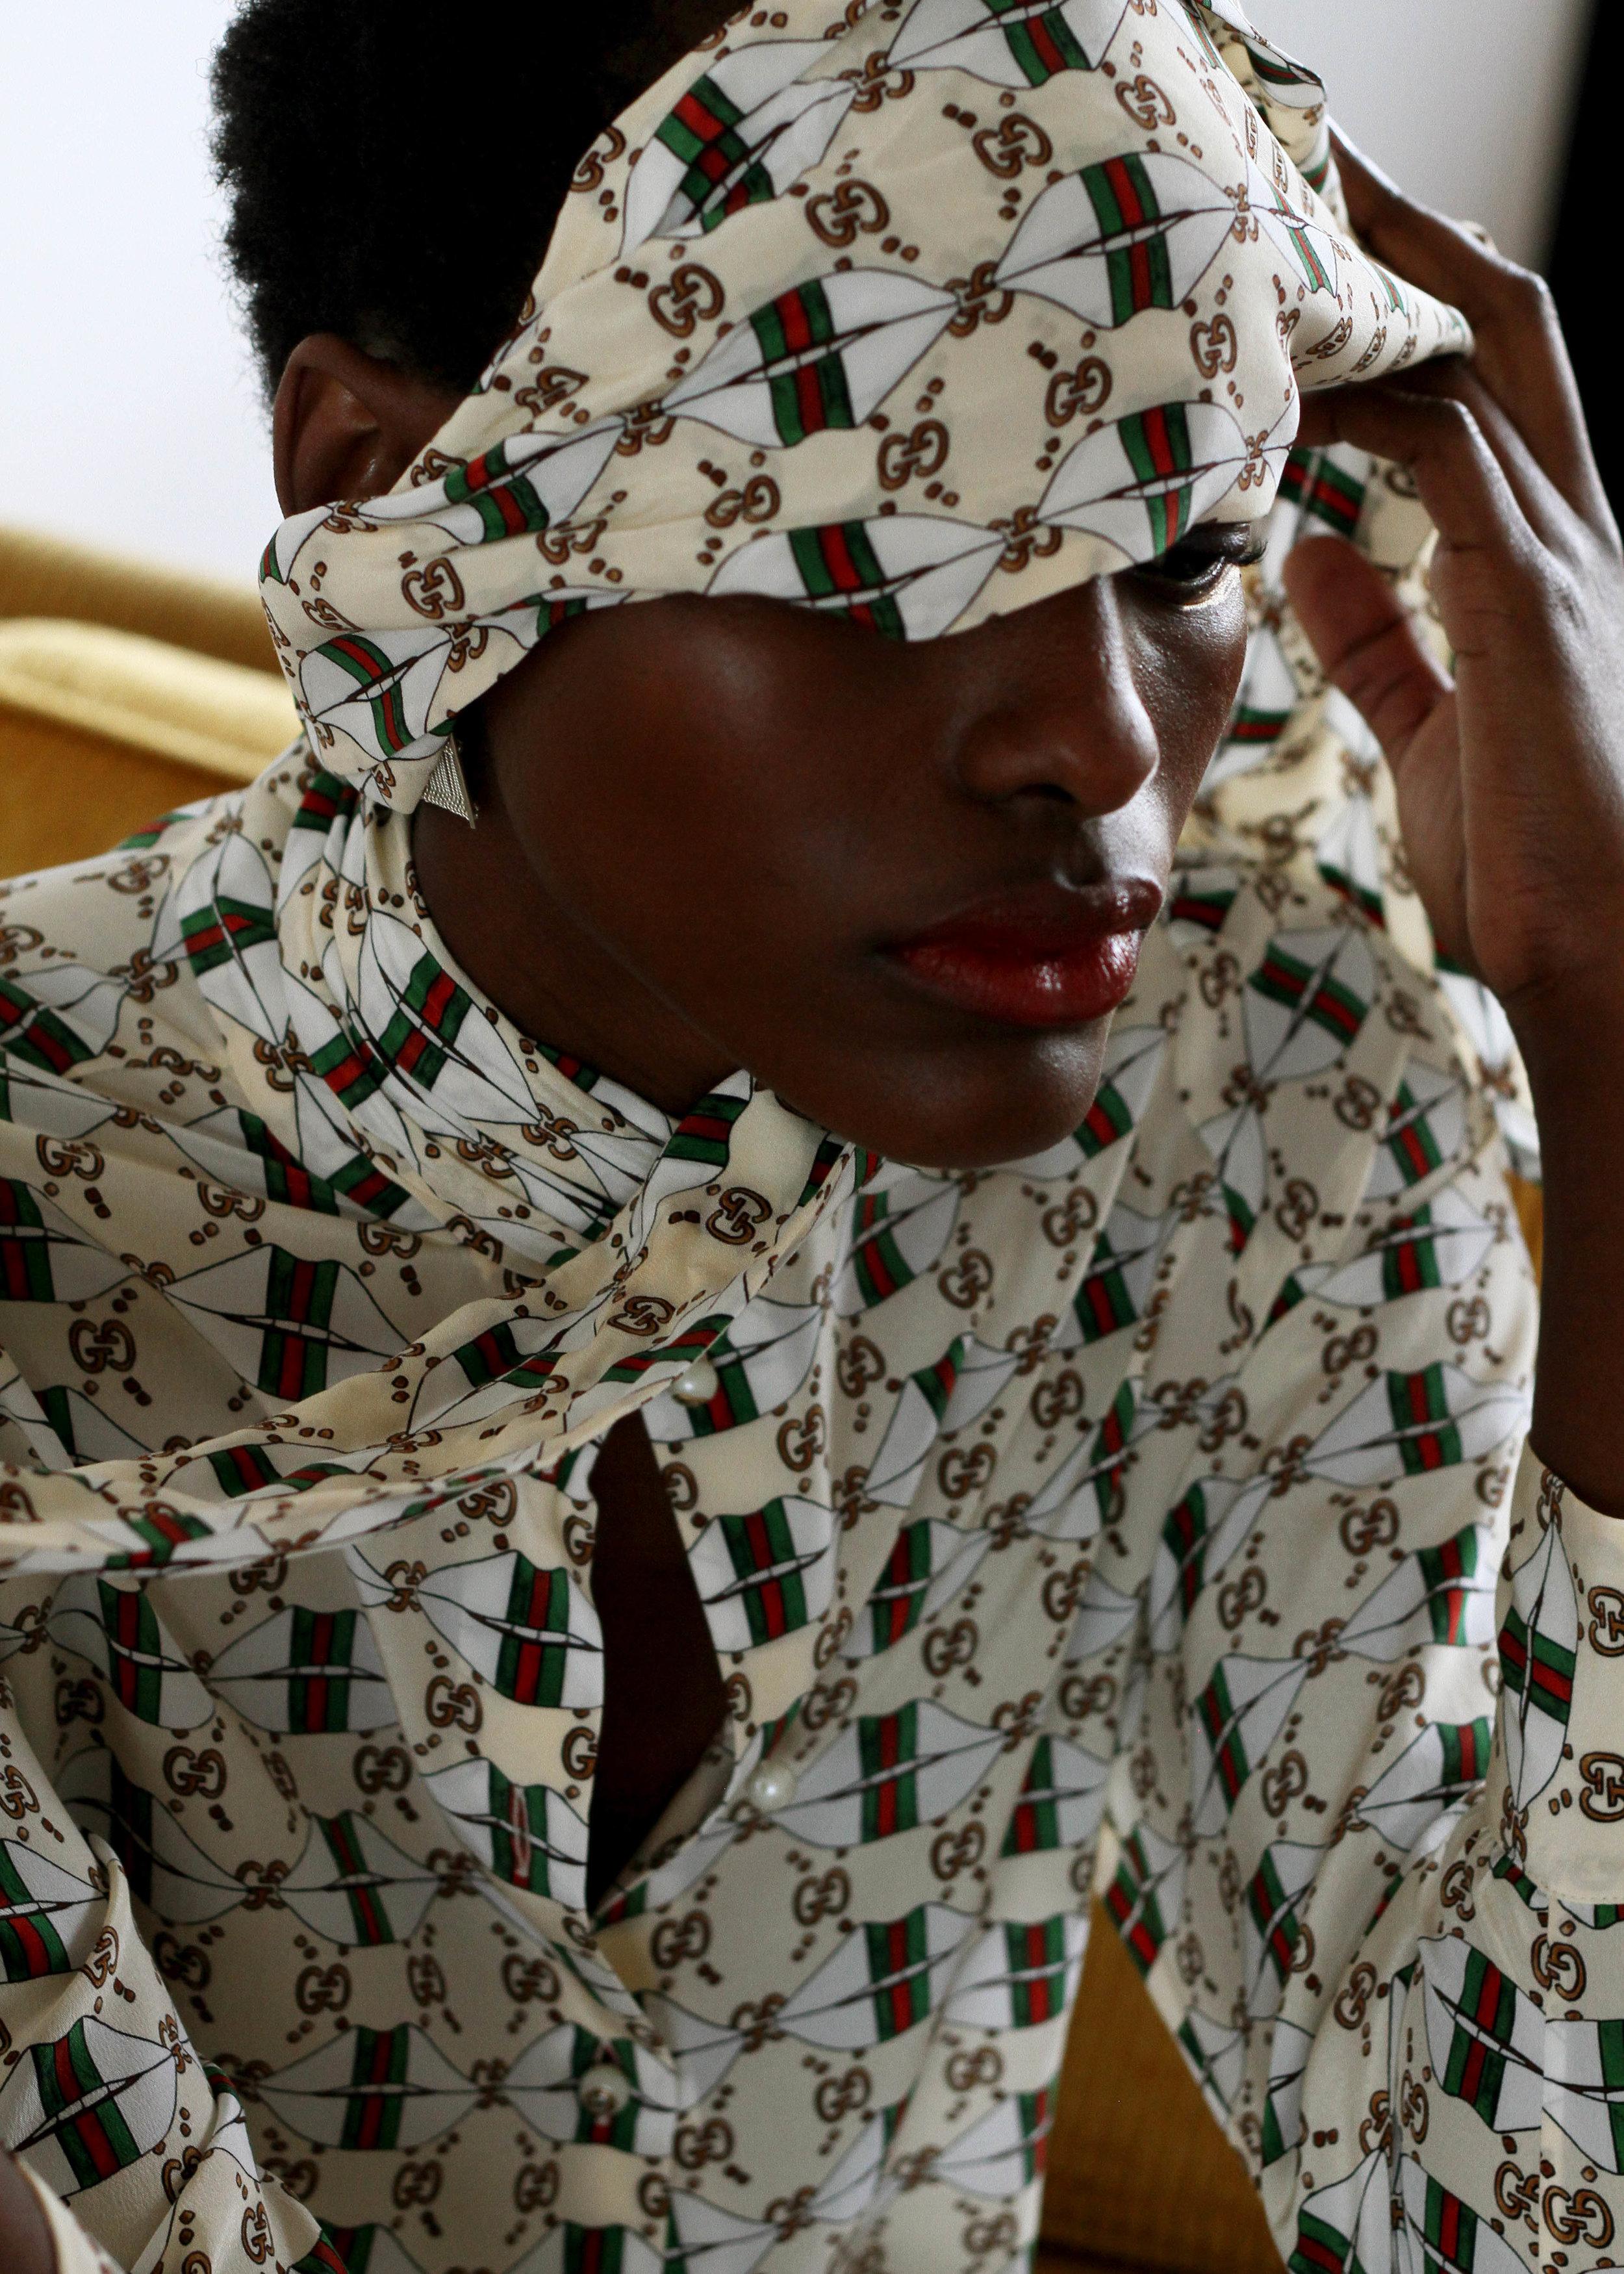 Blanc magazine   PROWL editorial Oct 2017 Photography - Mustafa Sarwar Model - Natasha Luwedde Styling -  I'll Be Your Mirror  MUA -  Madeleine V Brown  Set Design -  Holly Hmiddouche